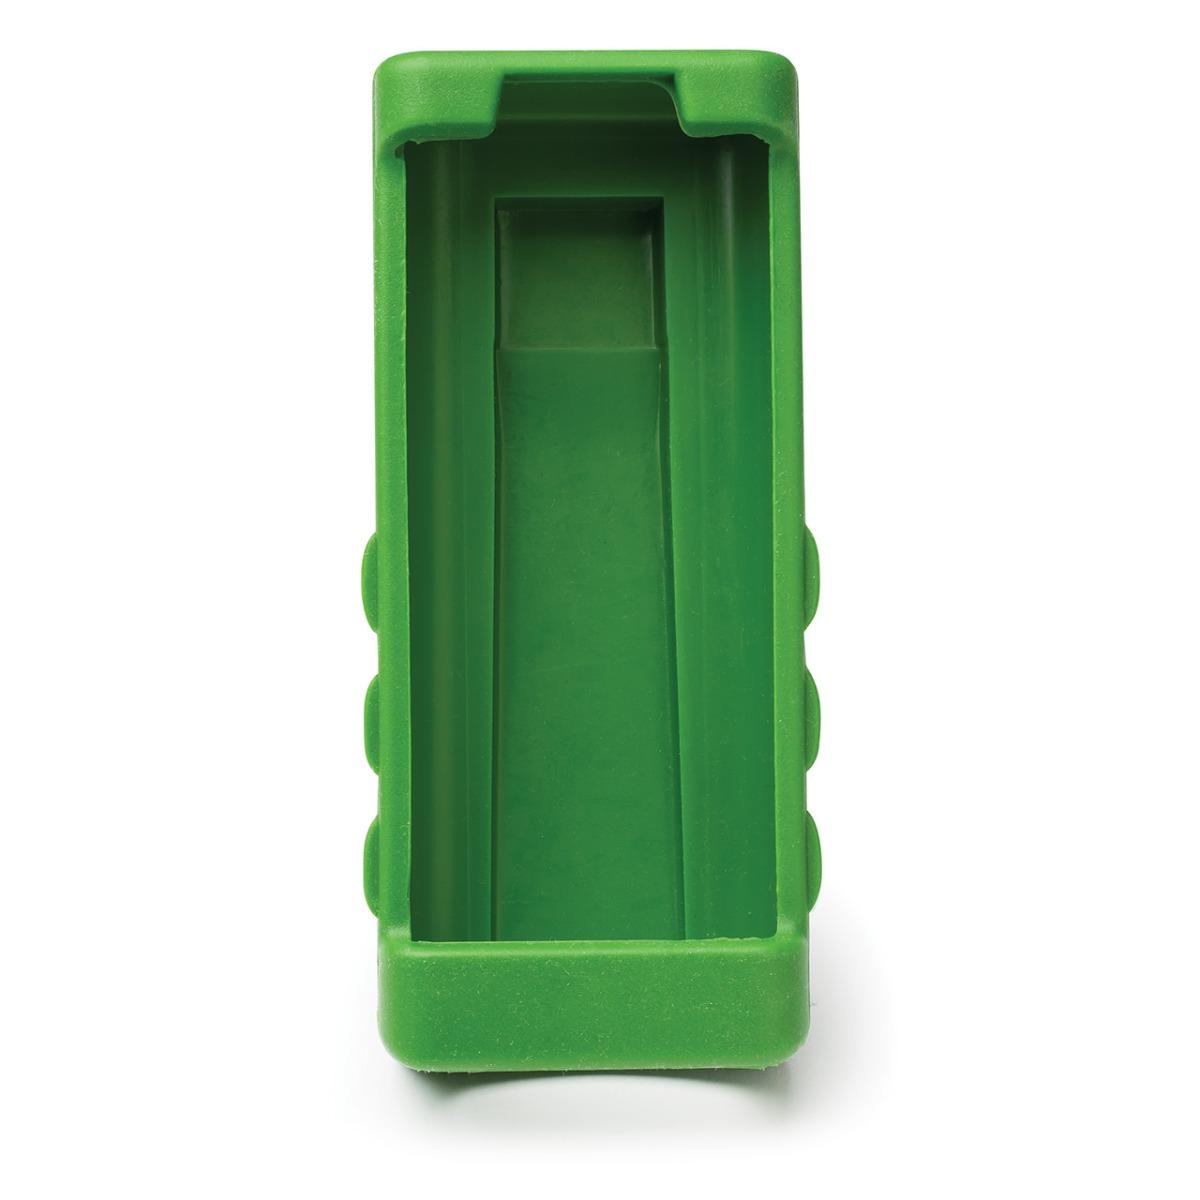 Funda de Goma a Prueba de Golpes (Verde) - HI710025  para HI9814